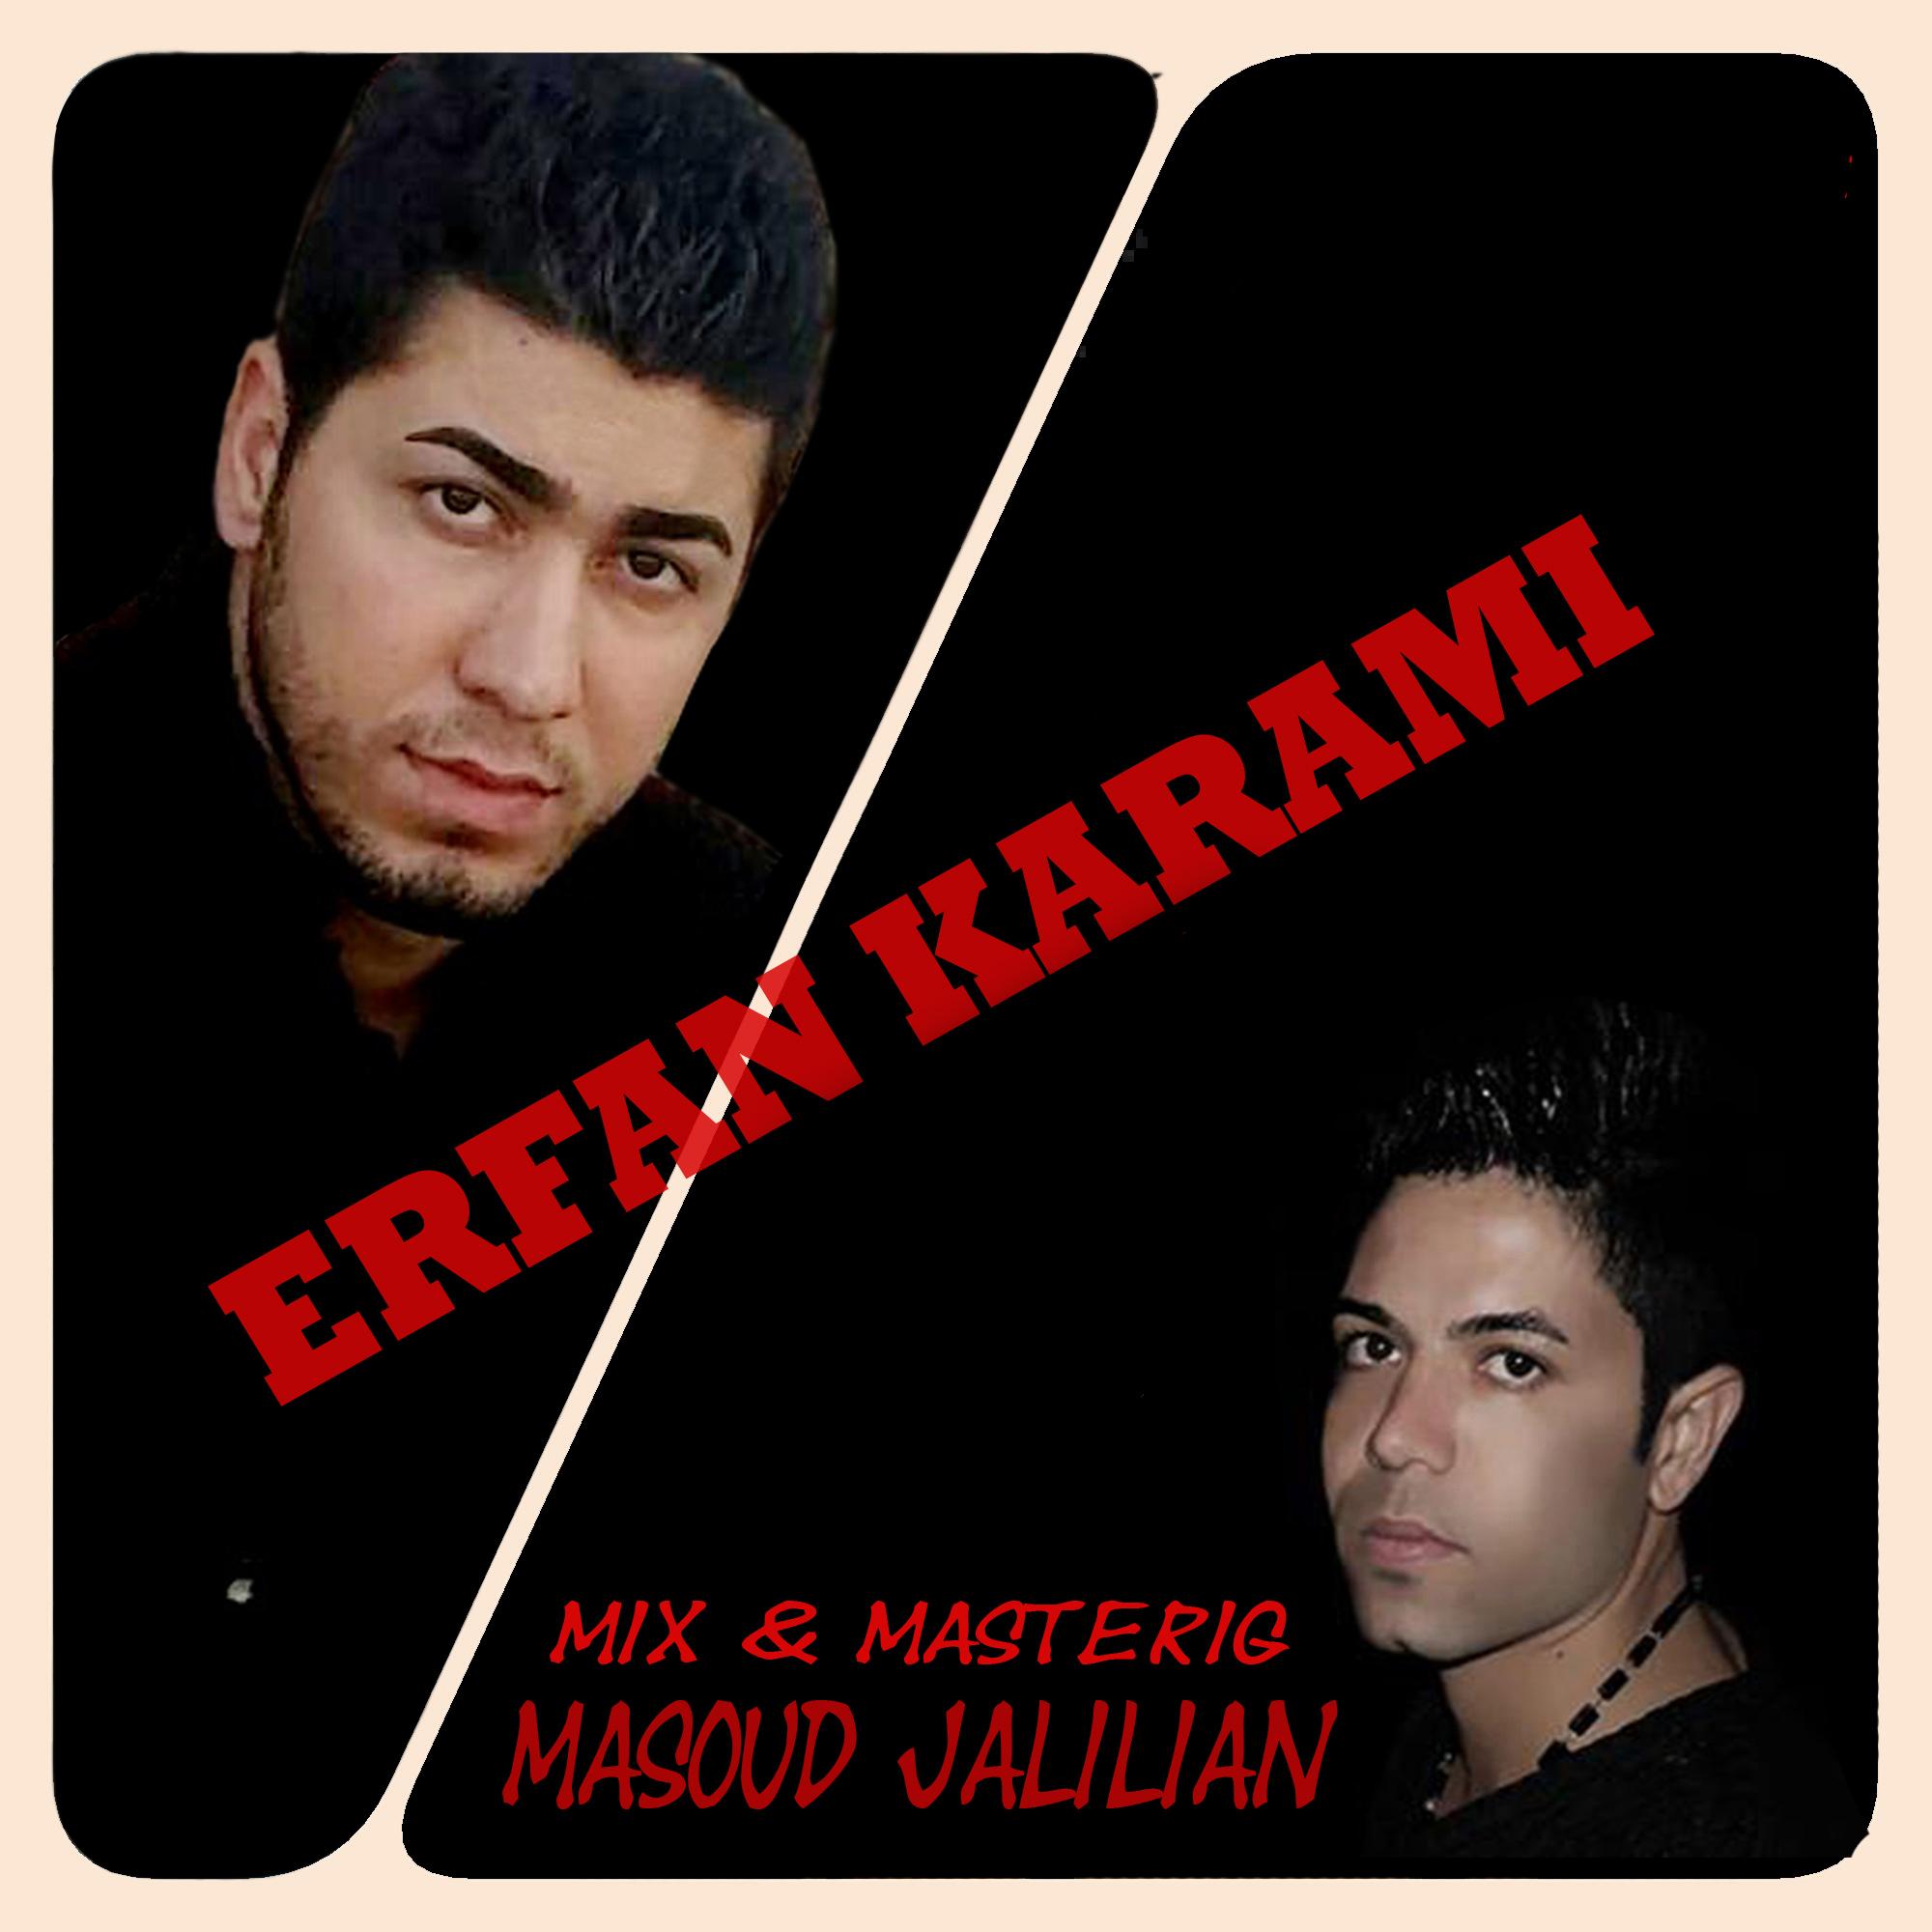 http://dl2.kord-music.net/1394/10/09/Erfan%20Karami.jpg